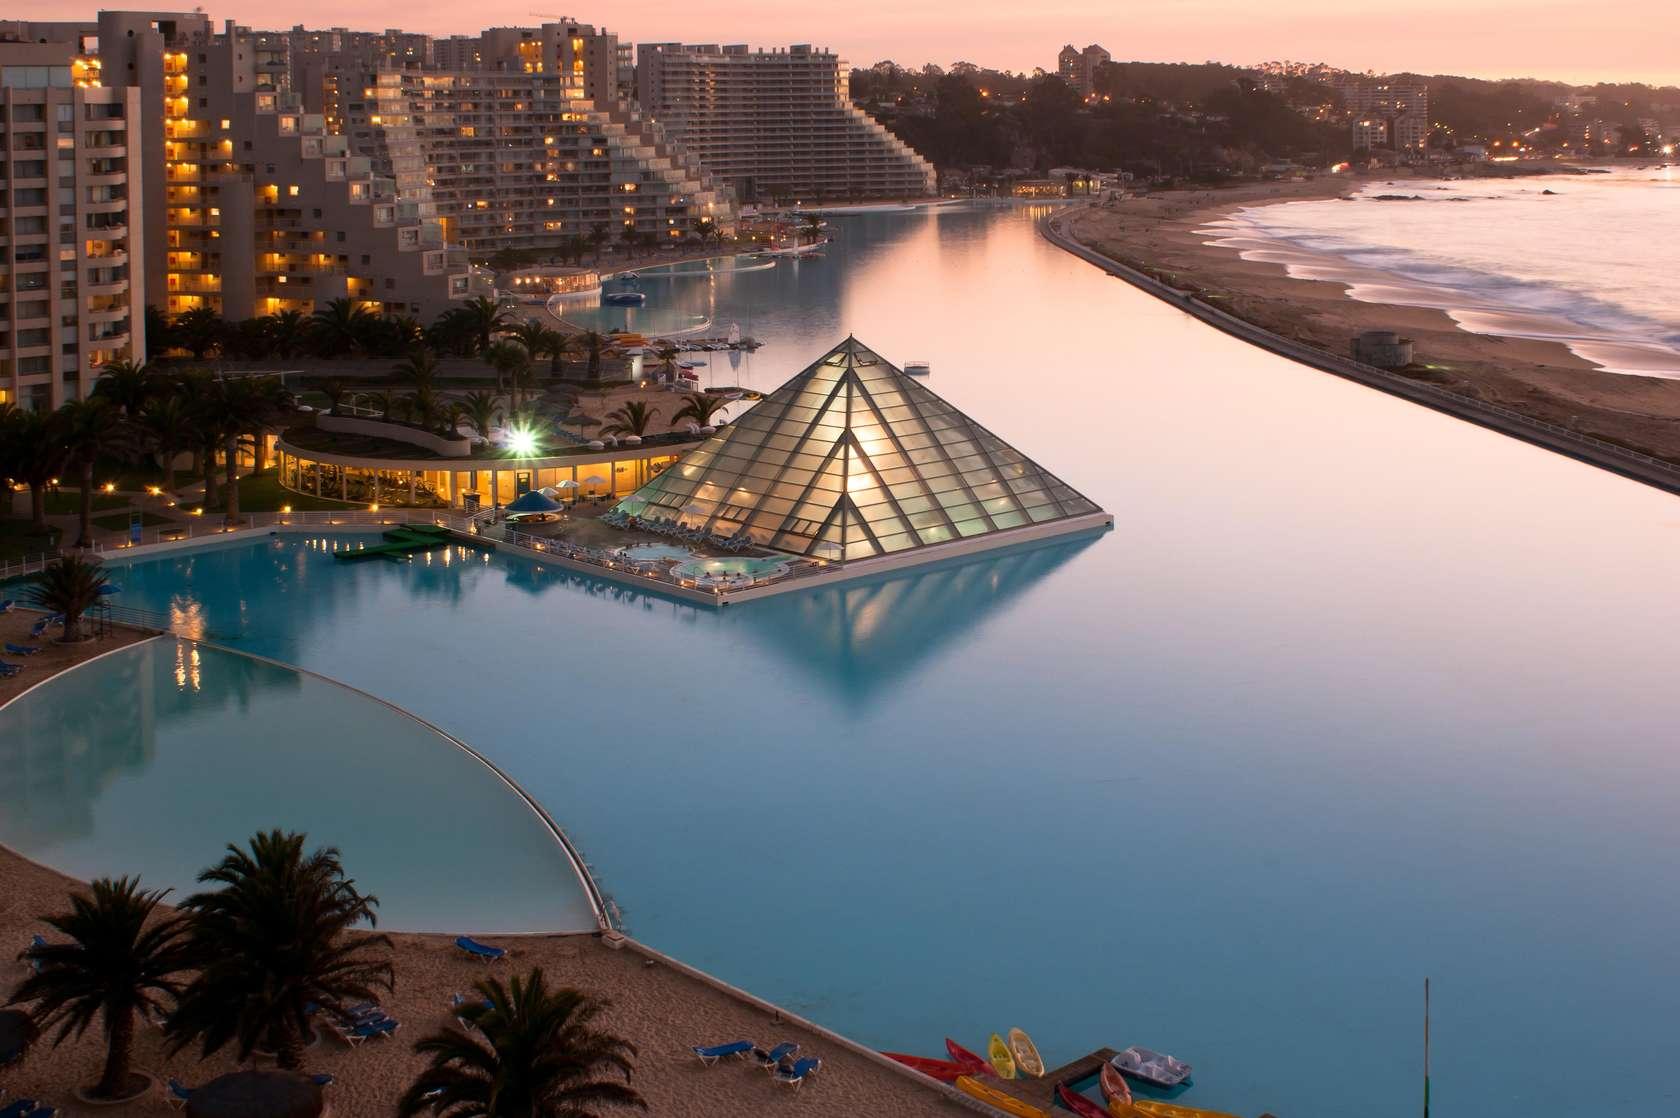 La piscine la plus chare du monde for La plus grande piscine du monde